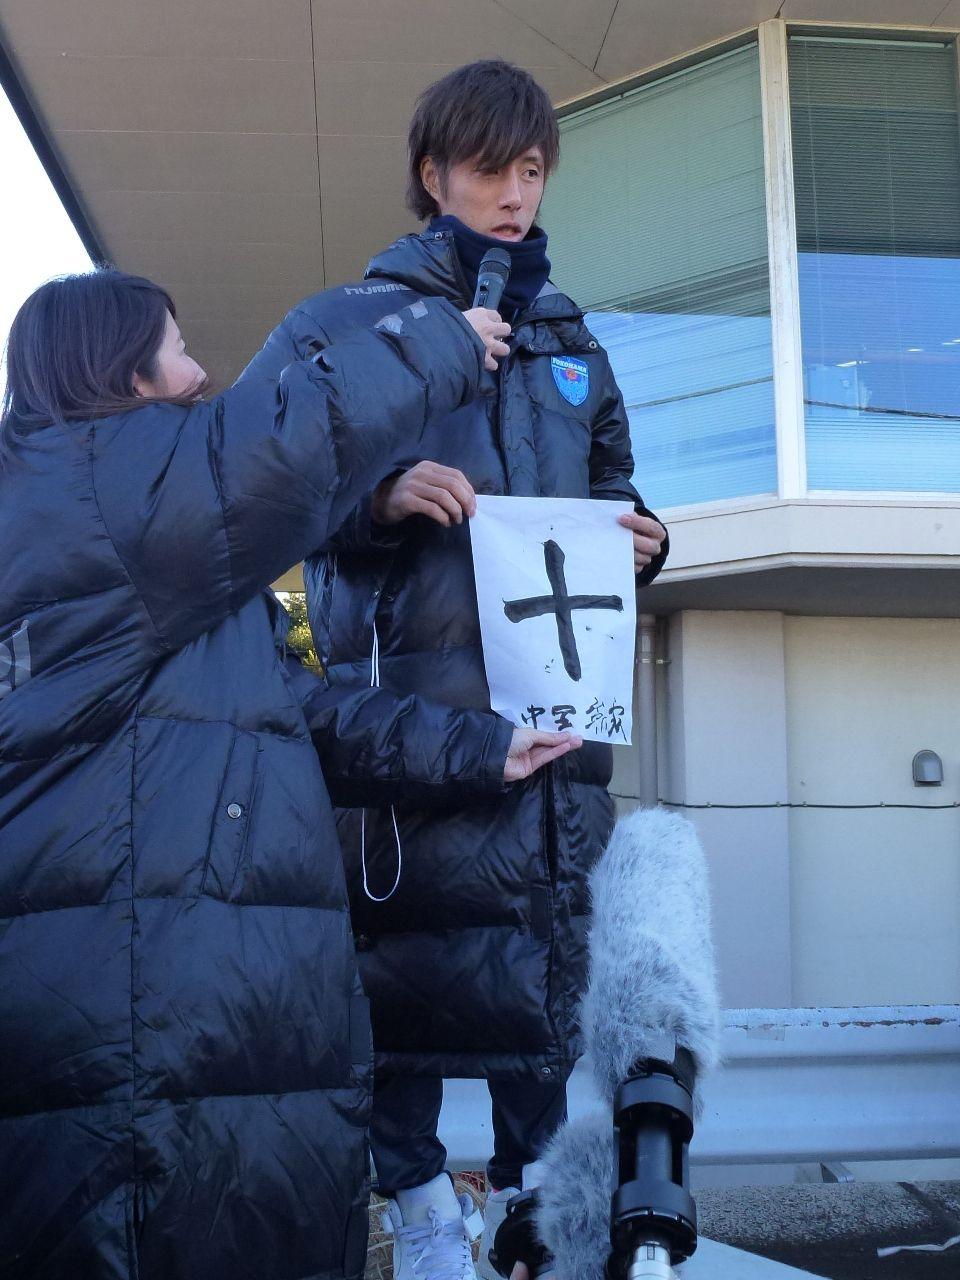 MF20中里崇宏 『十』 日刊!しし丸日記…『横浜FC』と『食』のブログ…:「2015横浜FC新